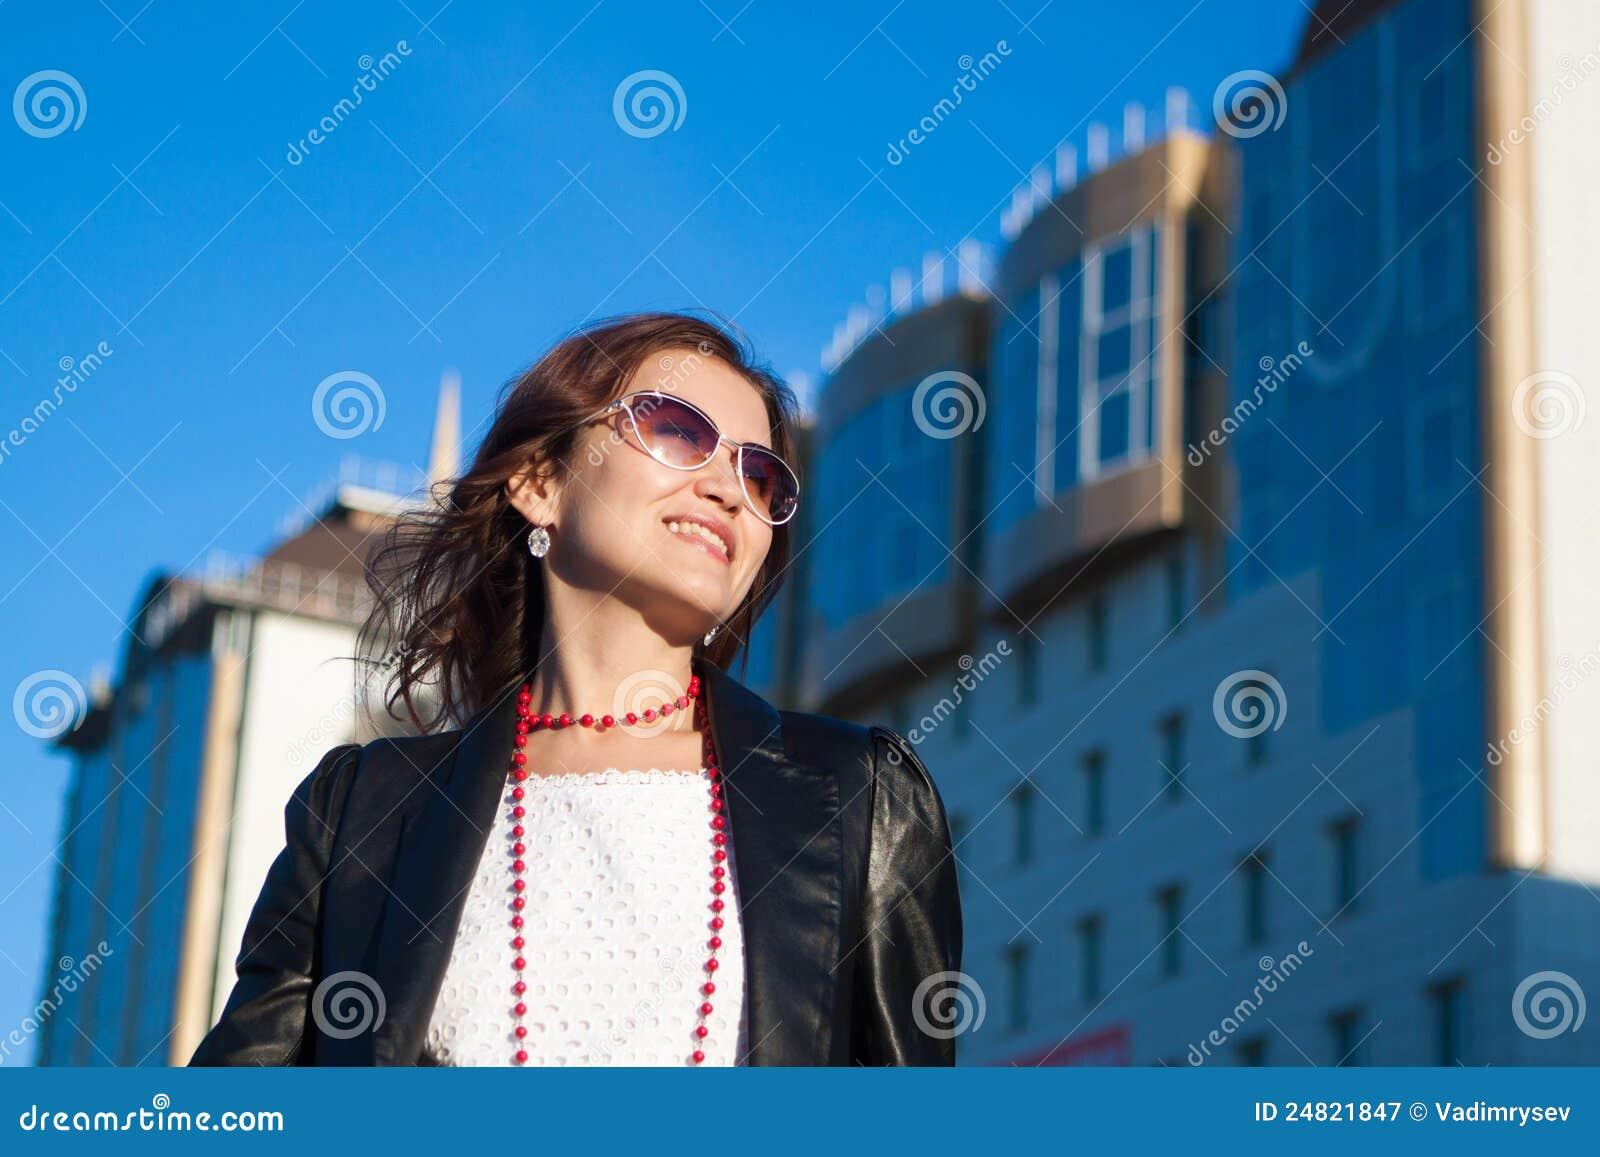 Happy woman on a city street